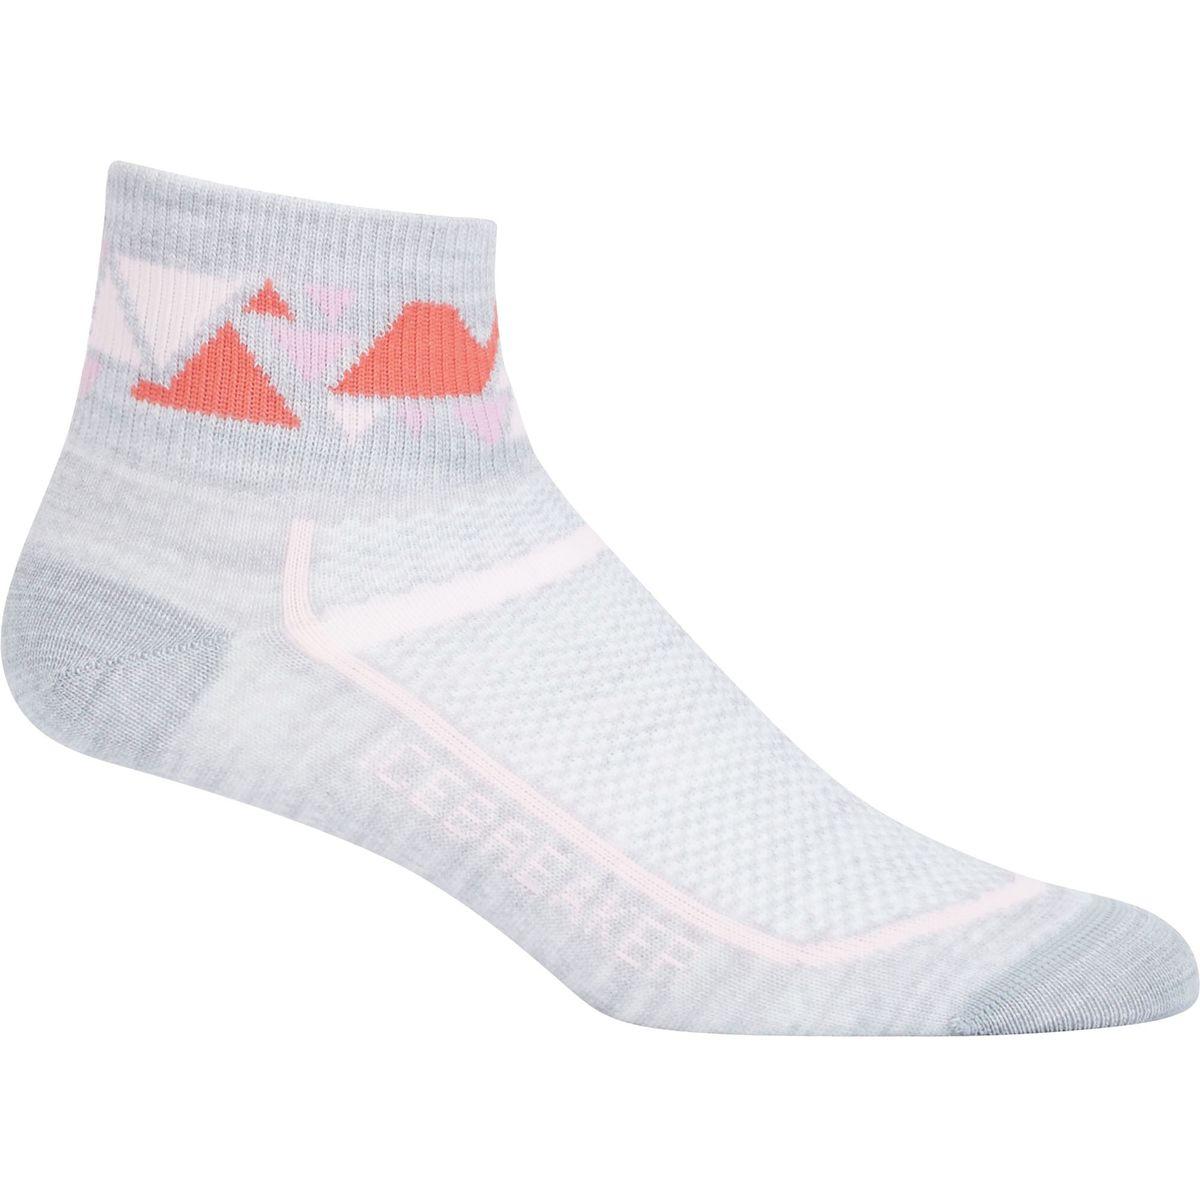 Icebreaker Multisport Ultralite Mini Sock - Women